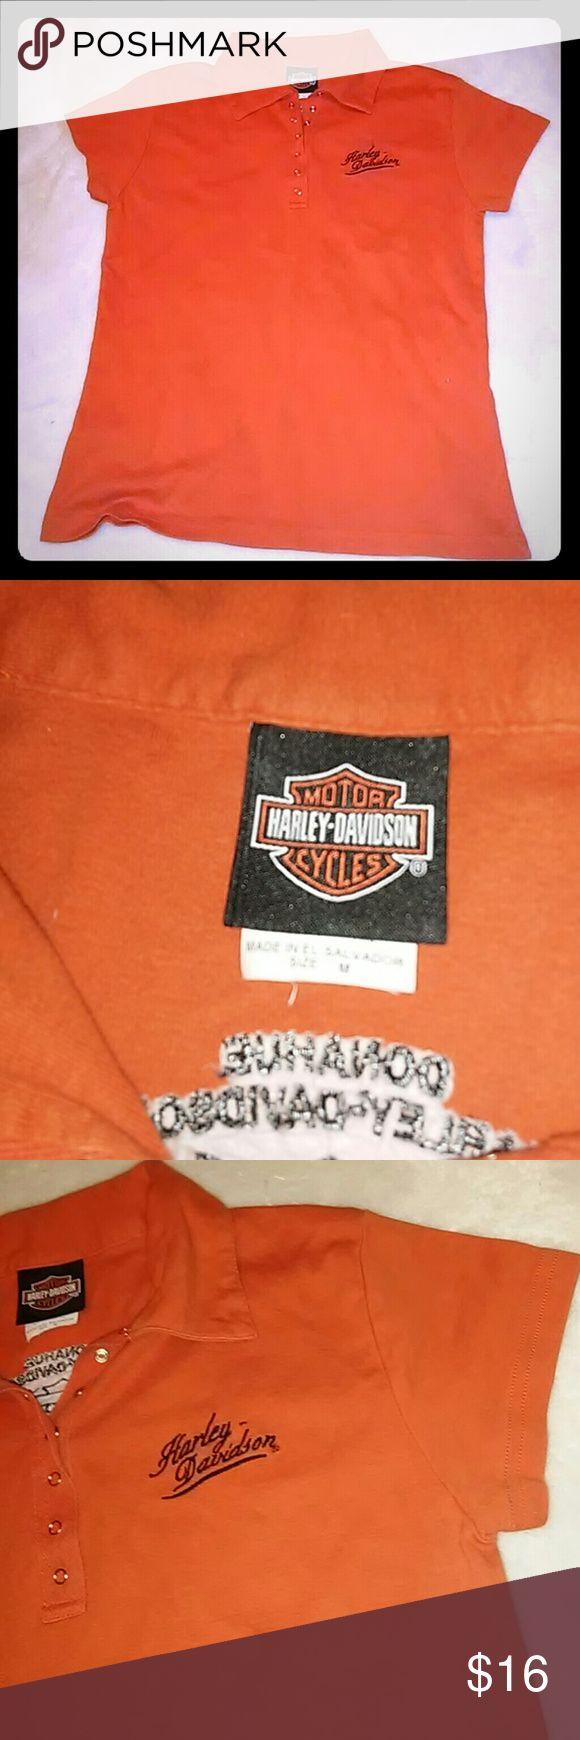 womens med. Harley Davidson shirt Worn a handful of times. Similar to a polo shirt. Shirt purchased from st.cloud harley davidson store. Harley-Davidson Tops Tees - Short Sleeve